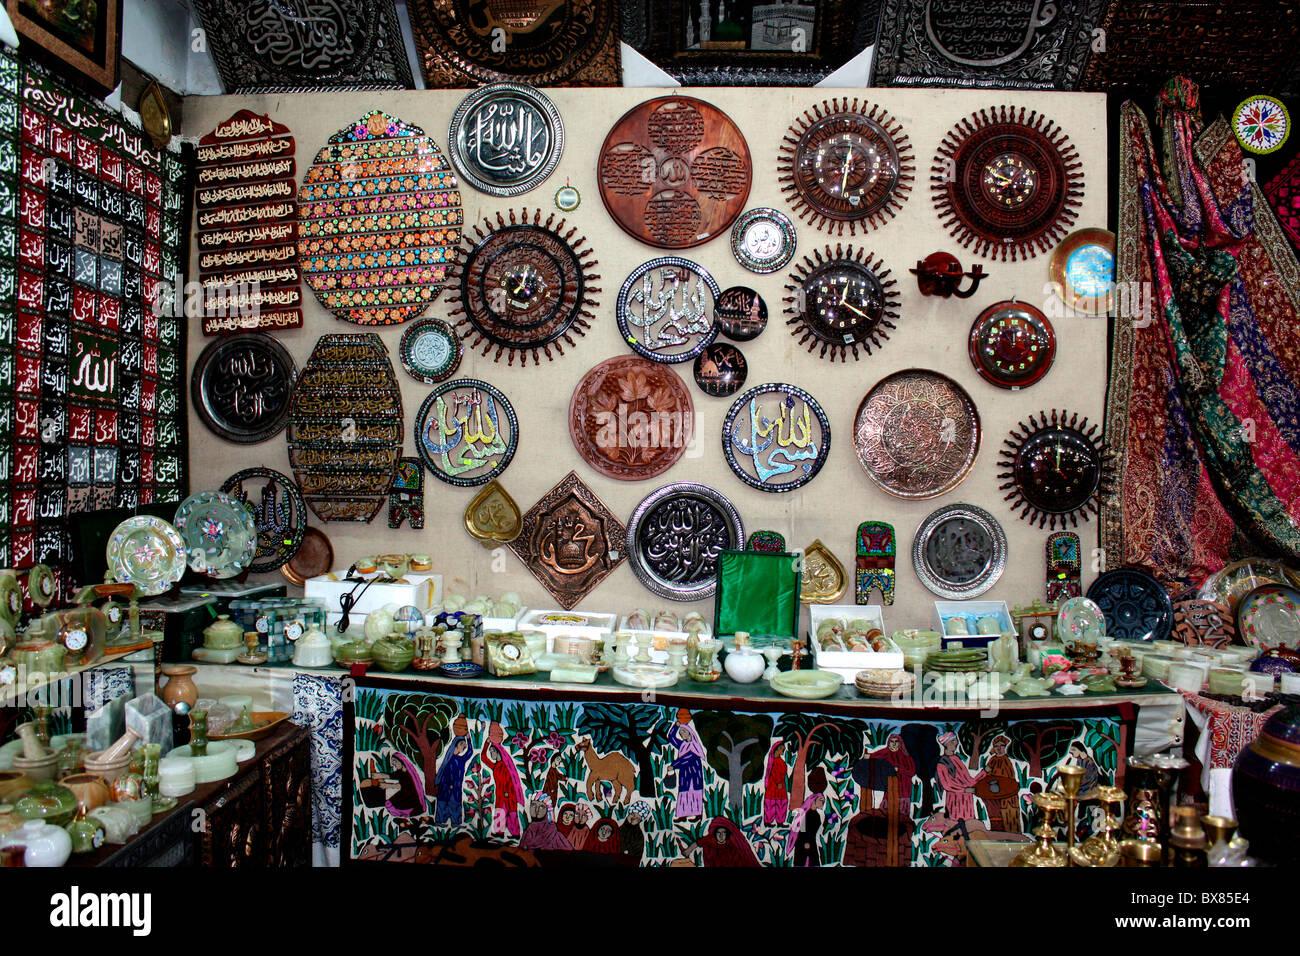 Handicrafts On Display At Muree Pakistan Stock Photo 33371356 Alamy